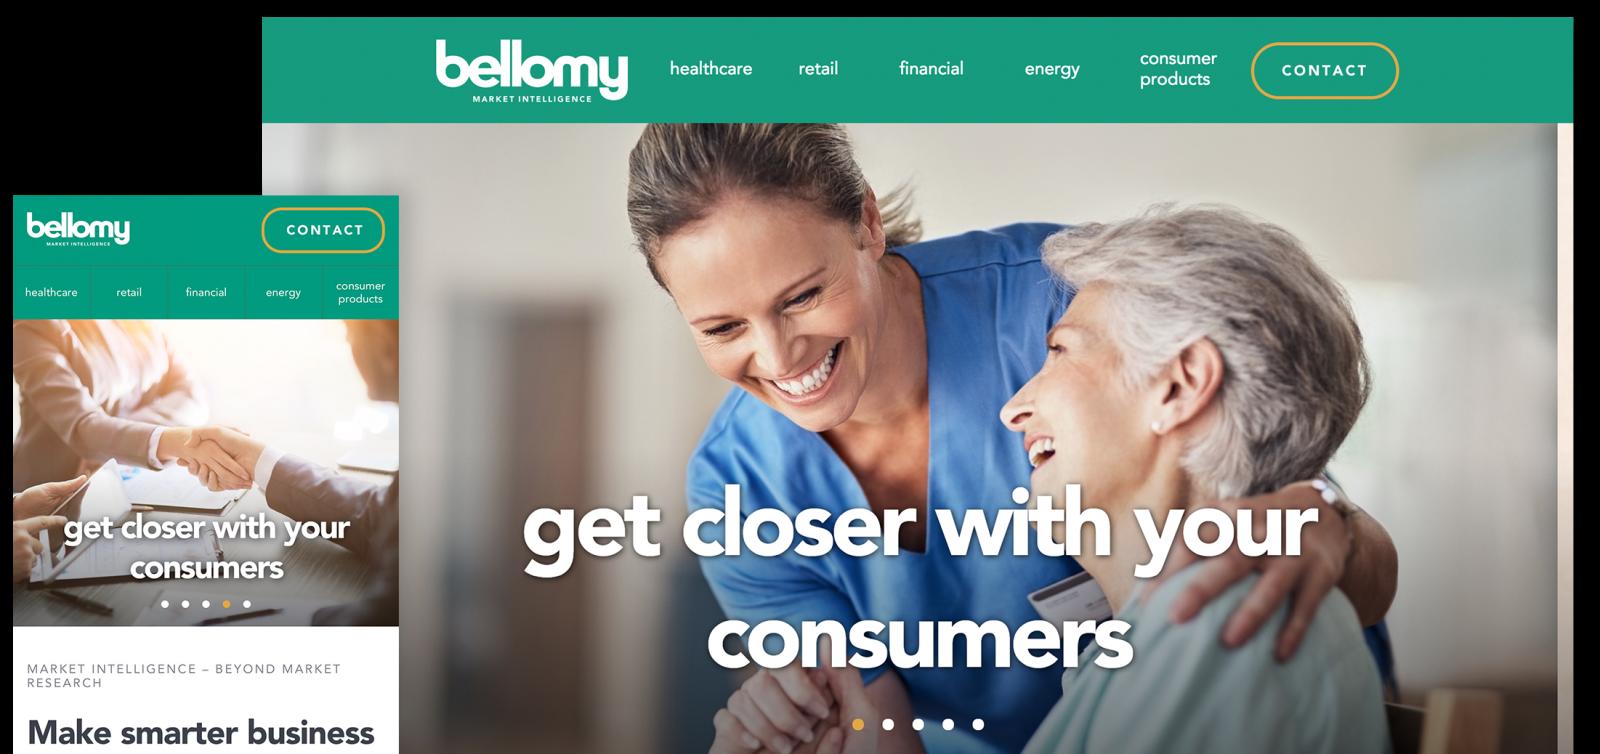 Bellomy website screenshots